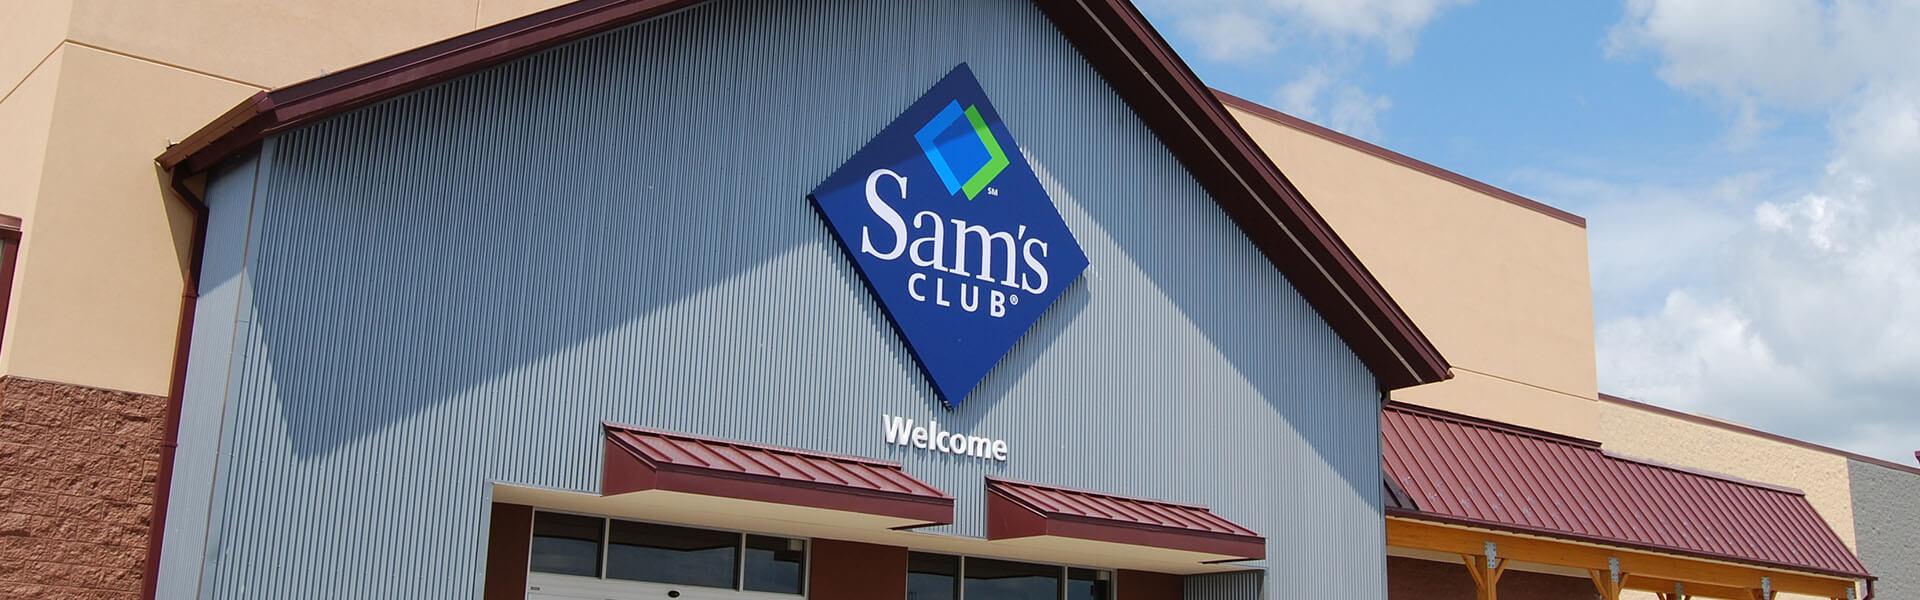 immel-banner_Sam's Club